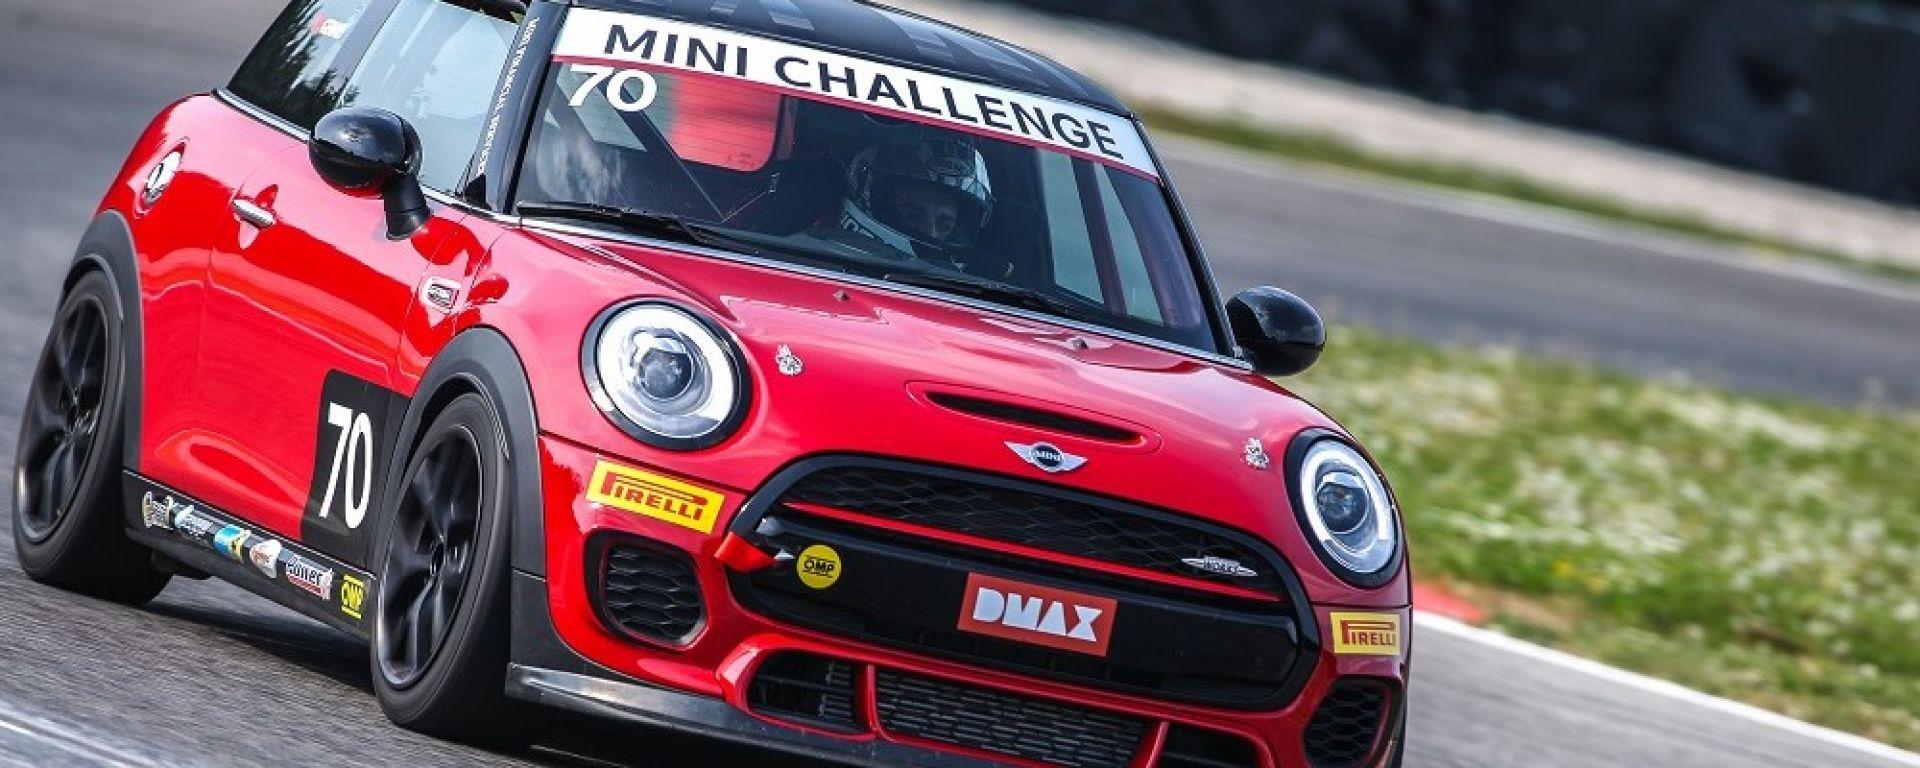 MINI Challenge John Cooper Works 2017